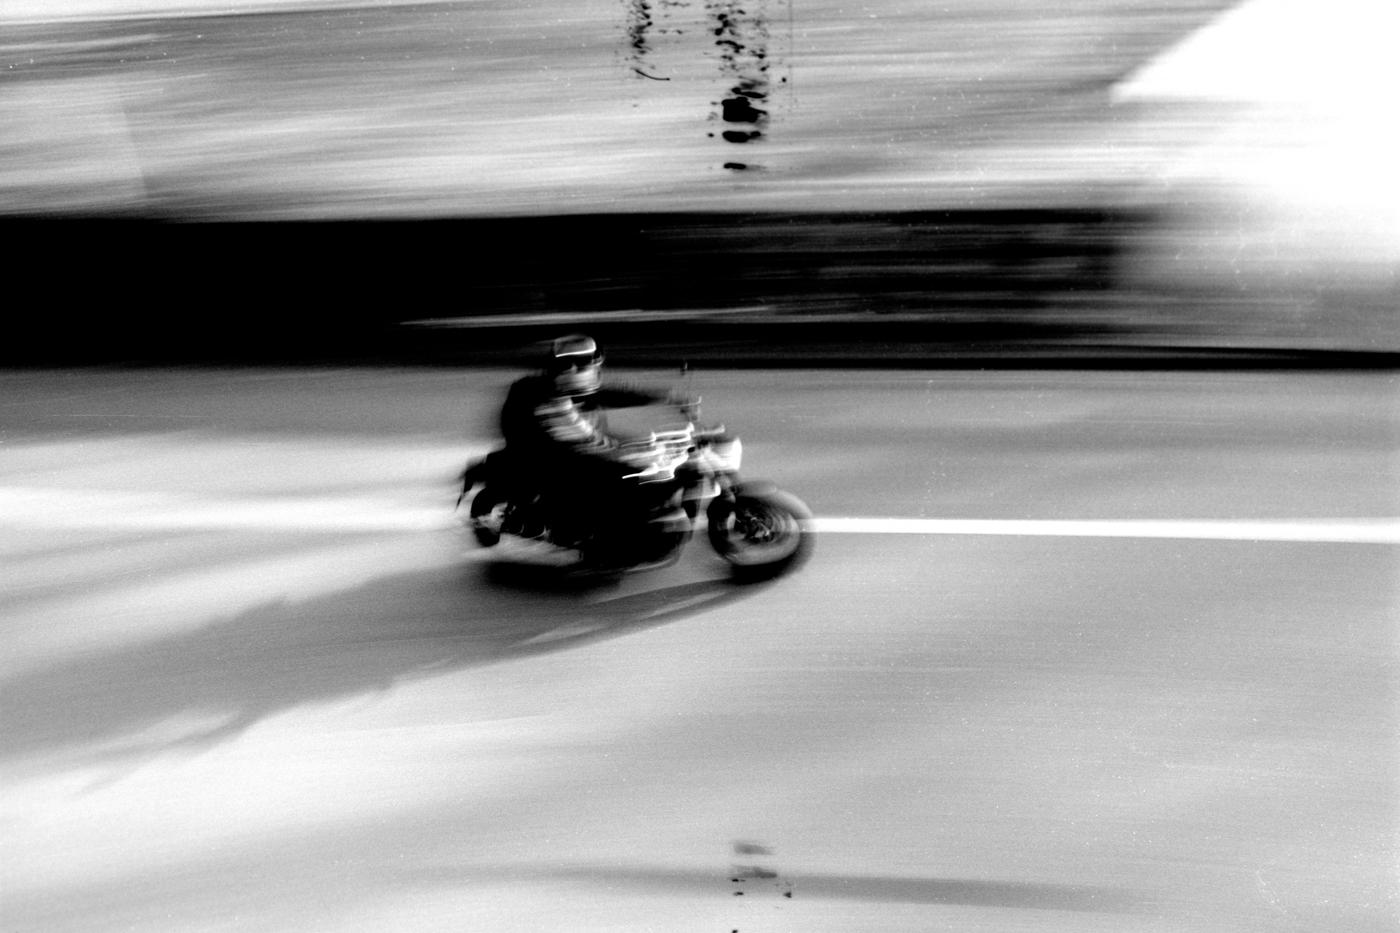 street photography Basel motorcycle leica m3 kodak tmax 100